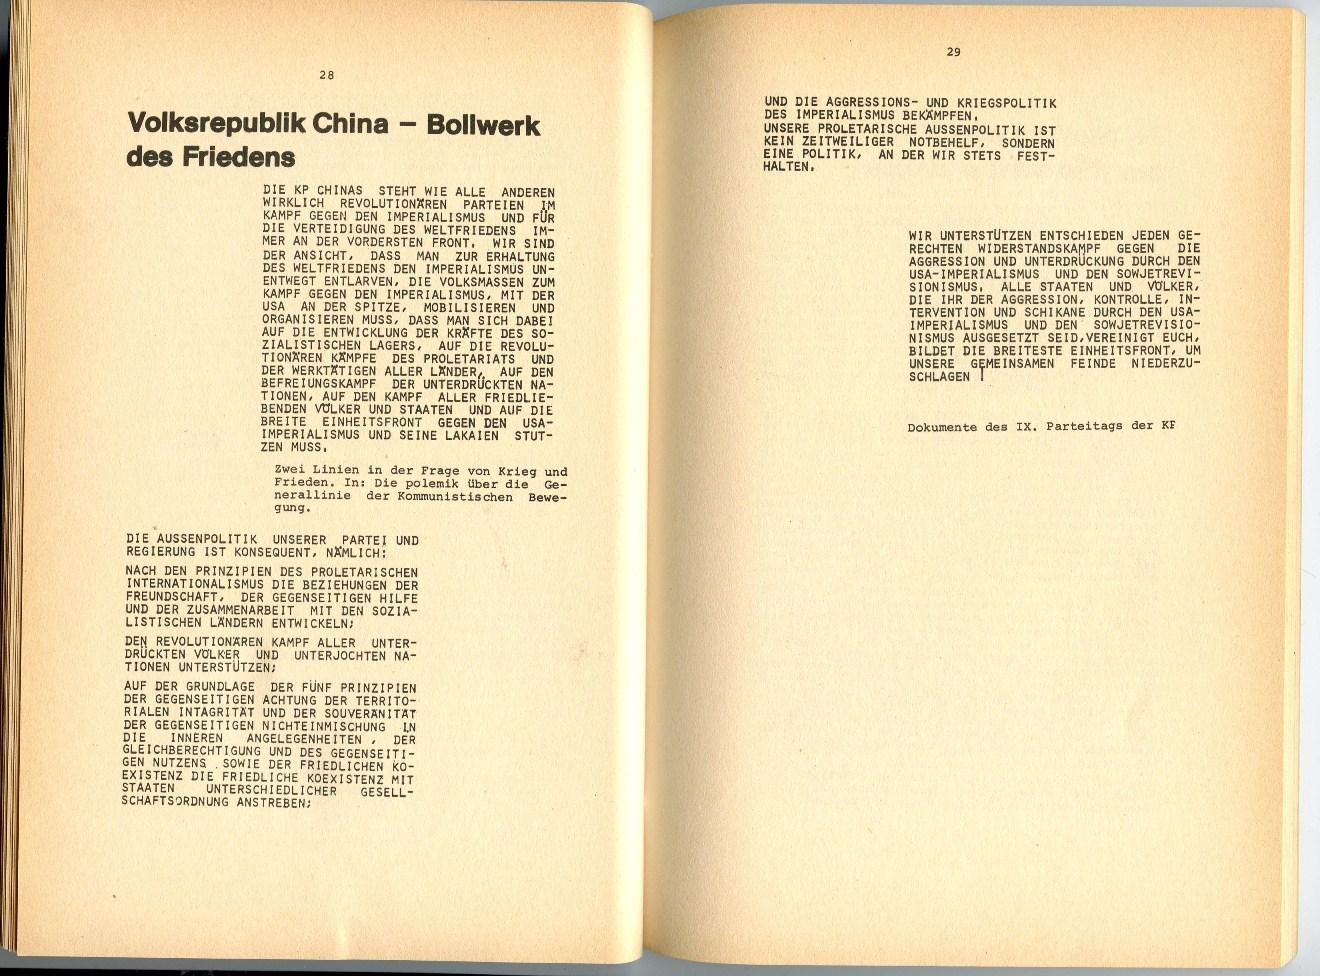 ZB_VRChina_Bollwerk_1971_16